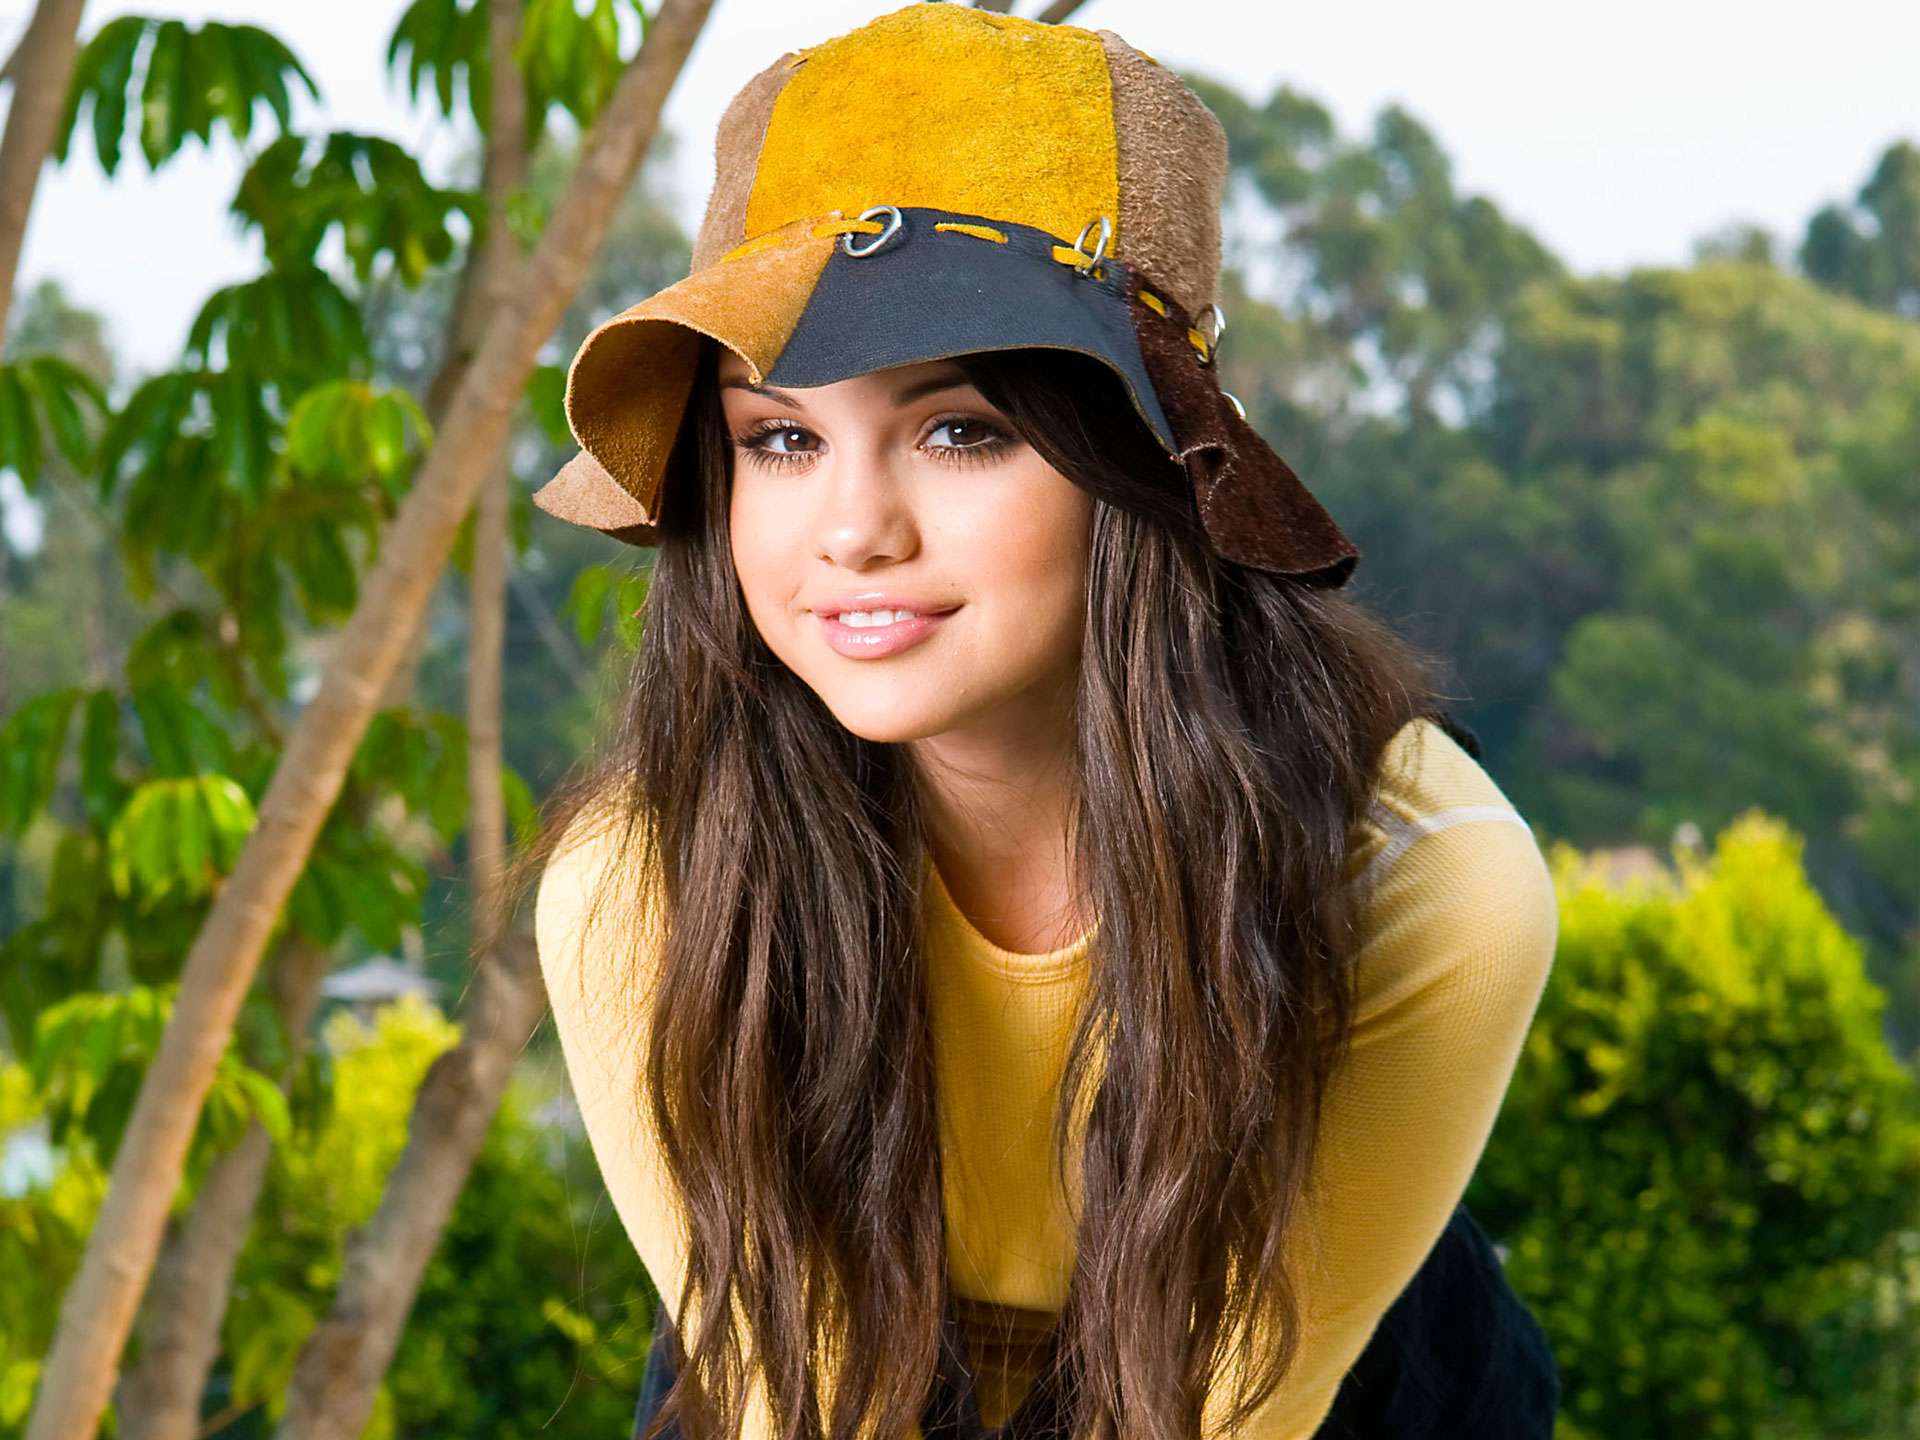 HD Wallpapers Selena Gomez 61